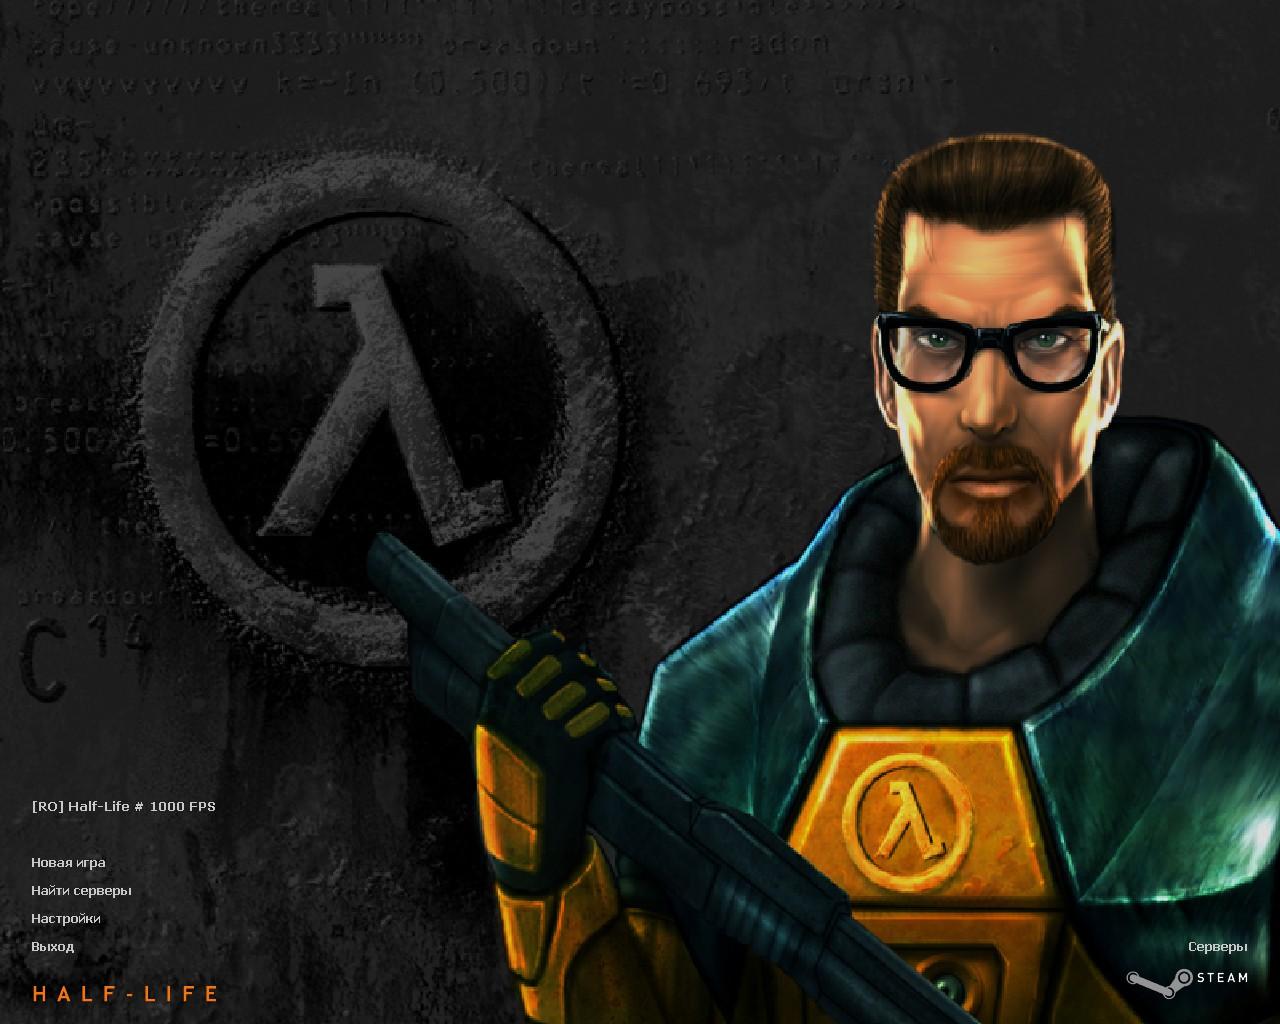 hl - Half-Life